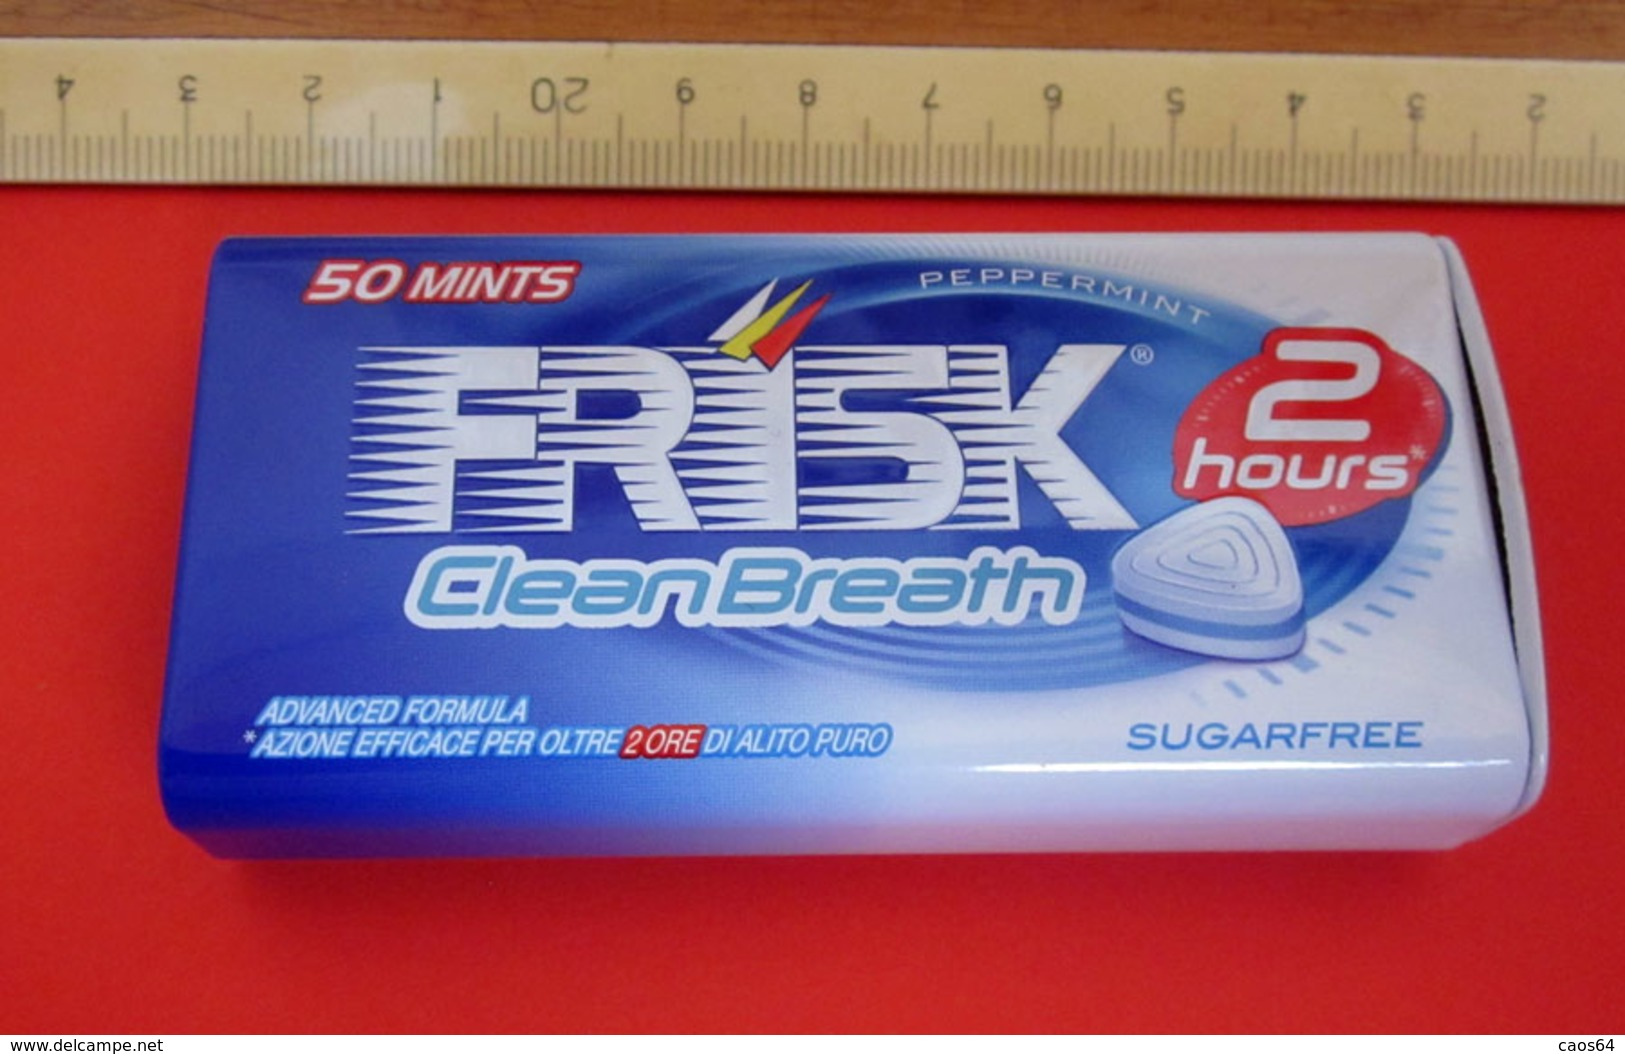 FRISK CLEAN BREATH 50 MINTS METAL SCATOLA - Scatole